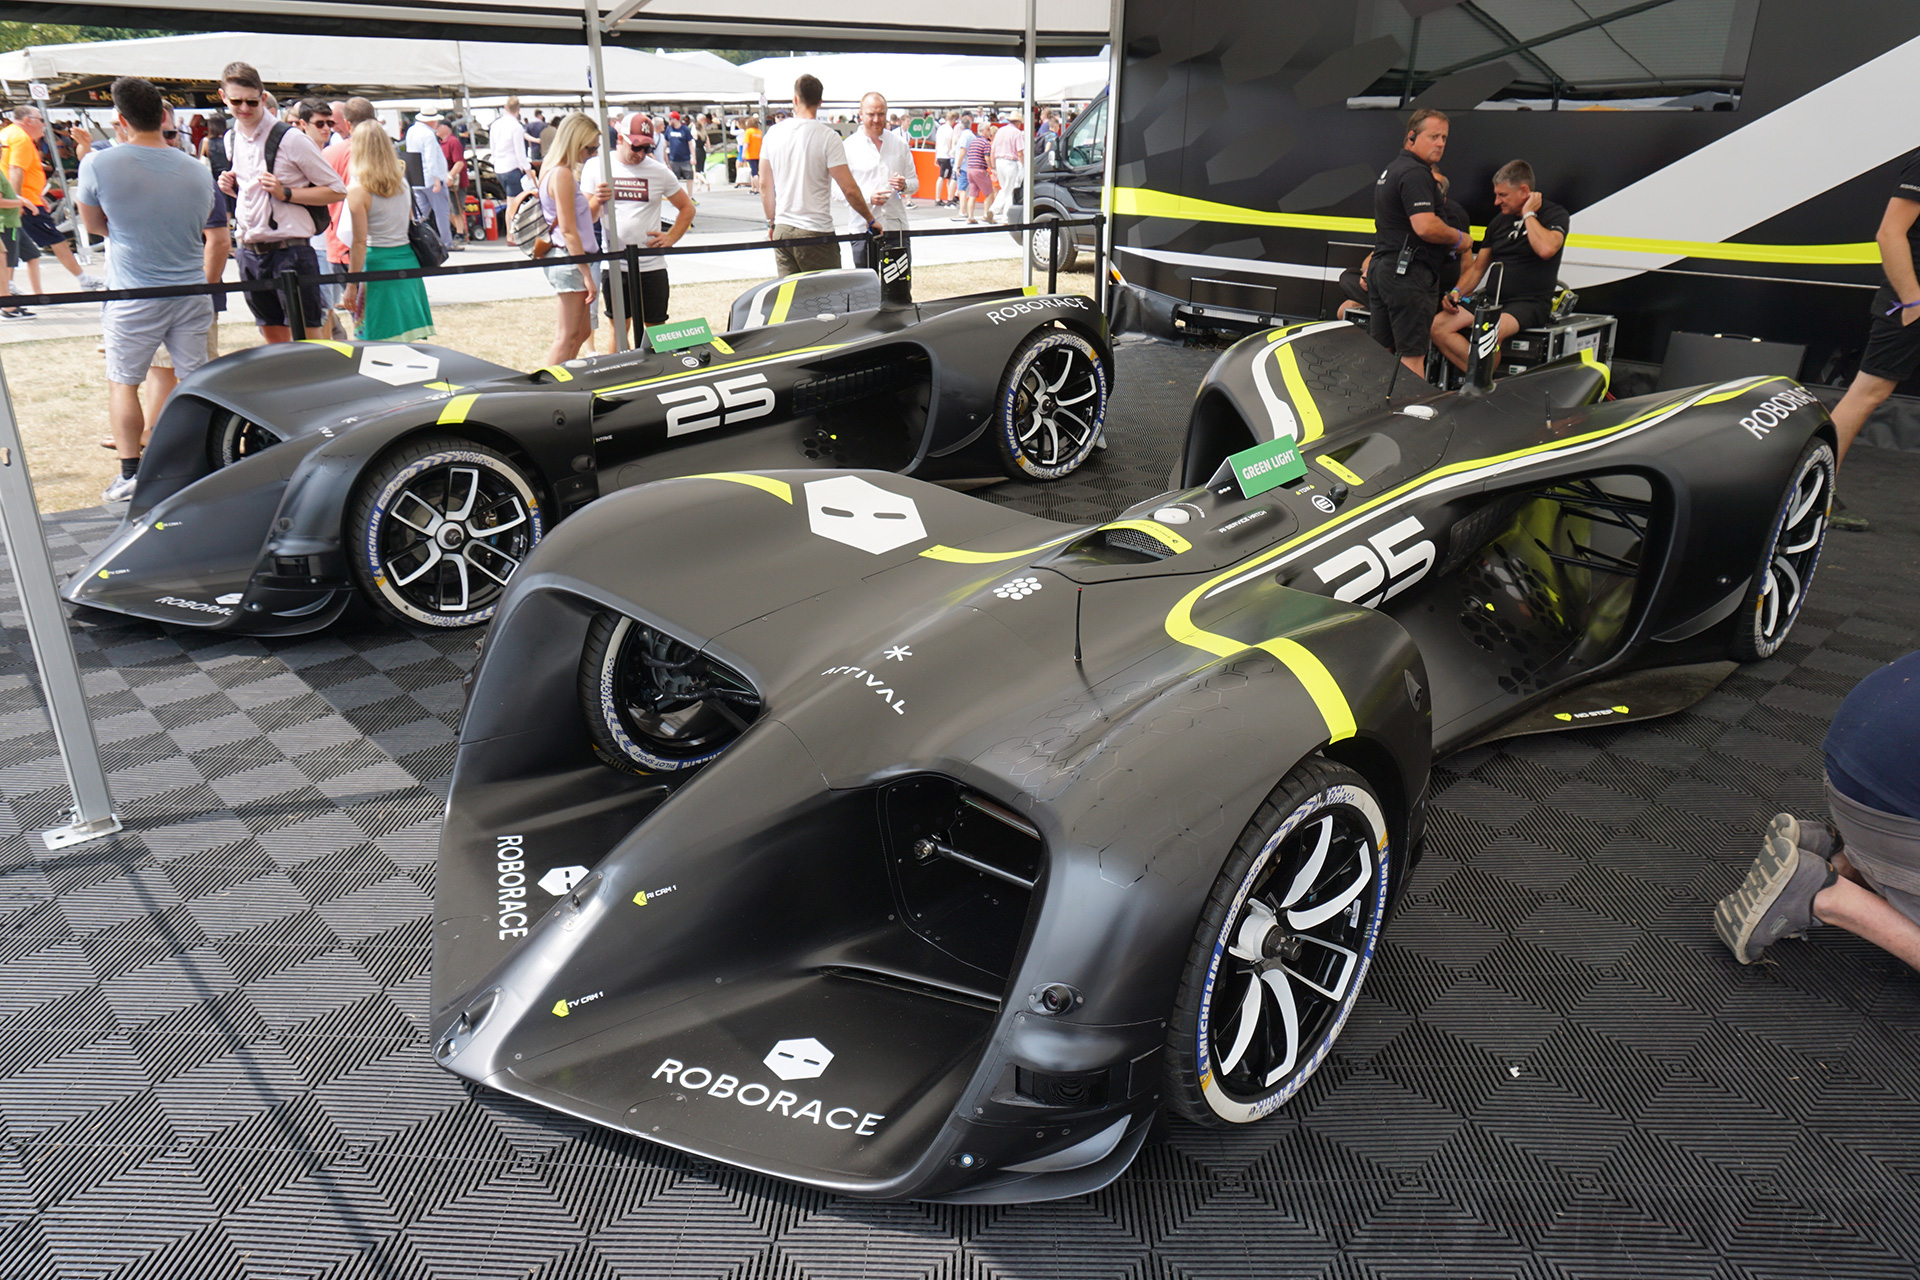 Goodwood FOS, Conceptual Racecars